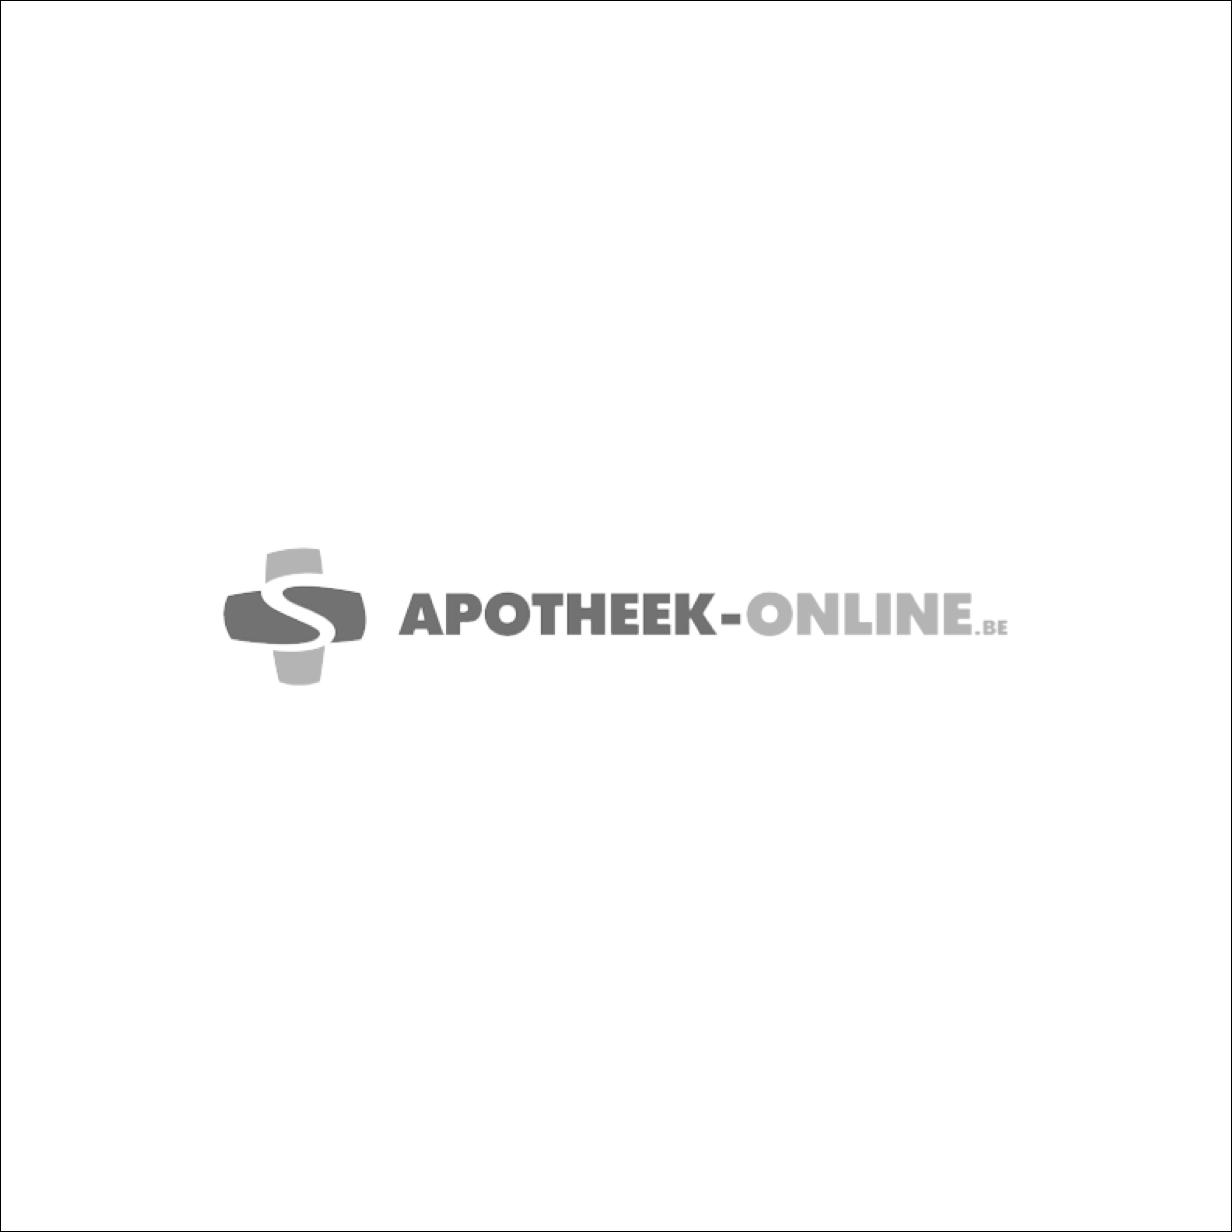 GAZIN CP N/STER 8P 5,0X 5,0CM 100 18500